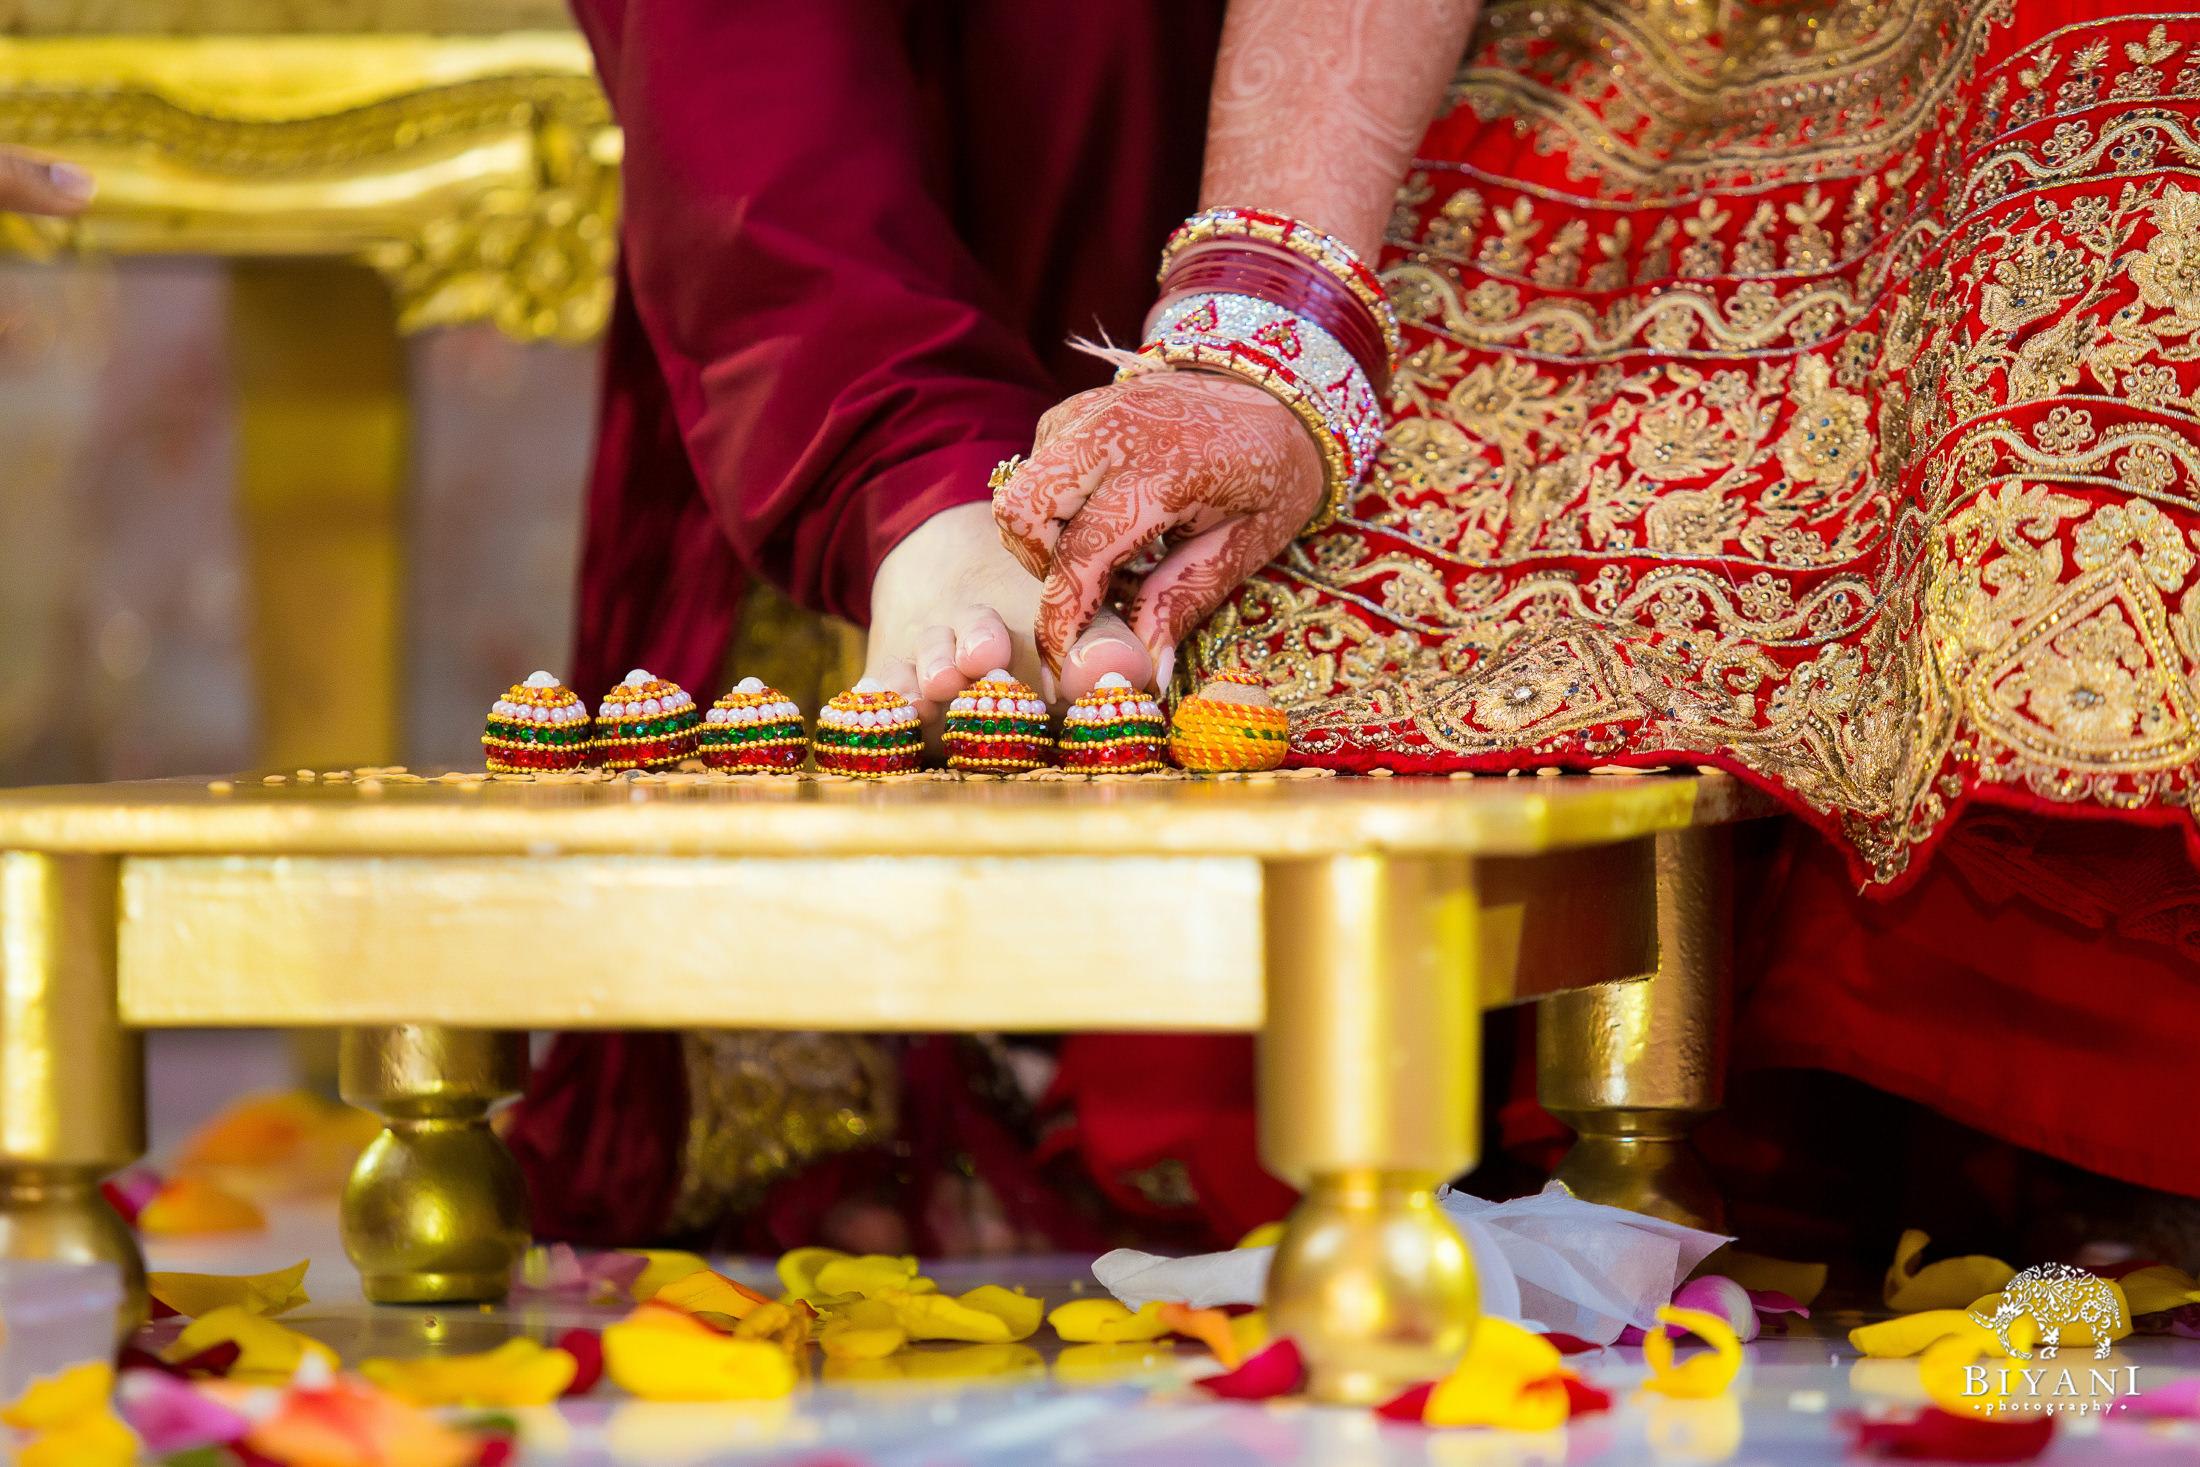 Bride performs traditional wedding ceremony activity to groom